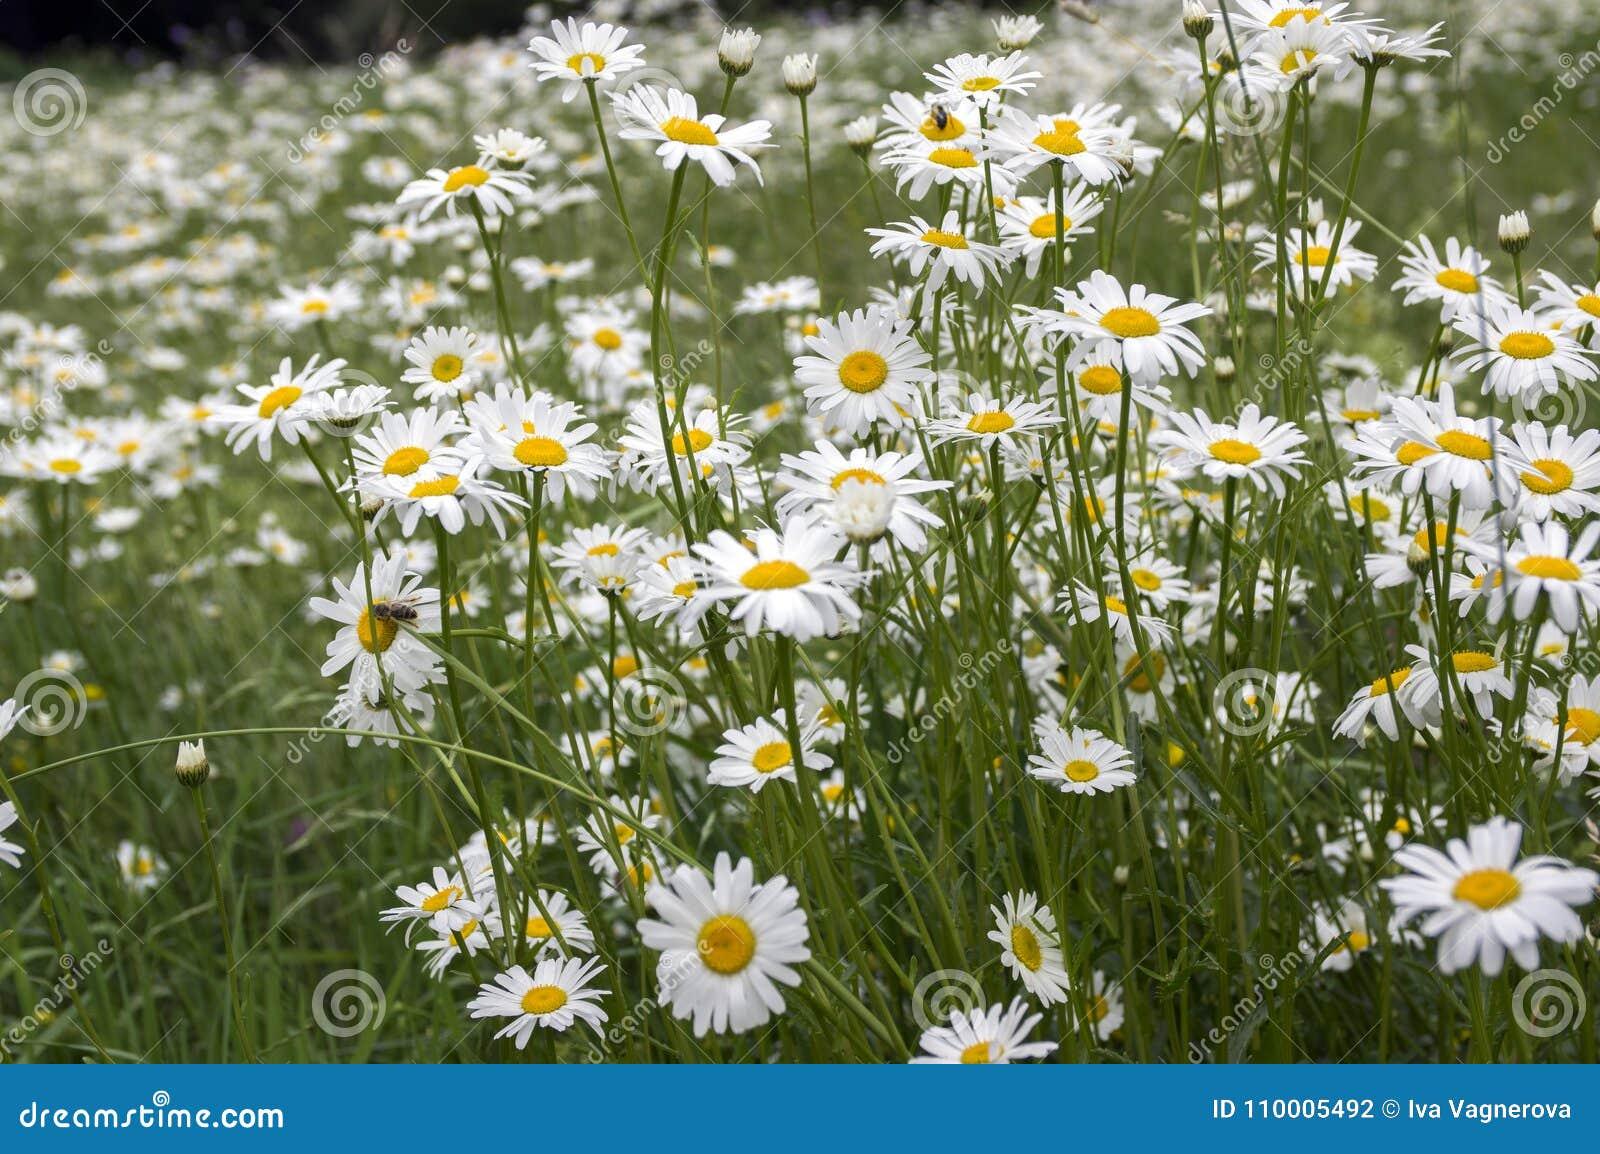 Leucanthemum vulgare meadows wild flowers with white petals and download leucanthemum vulgare meadows wild flowers with white petals and yellow center in bloom stock photo mightylinksfo